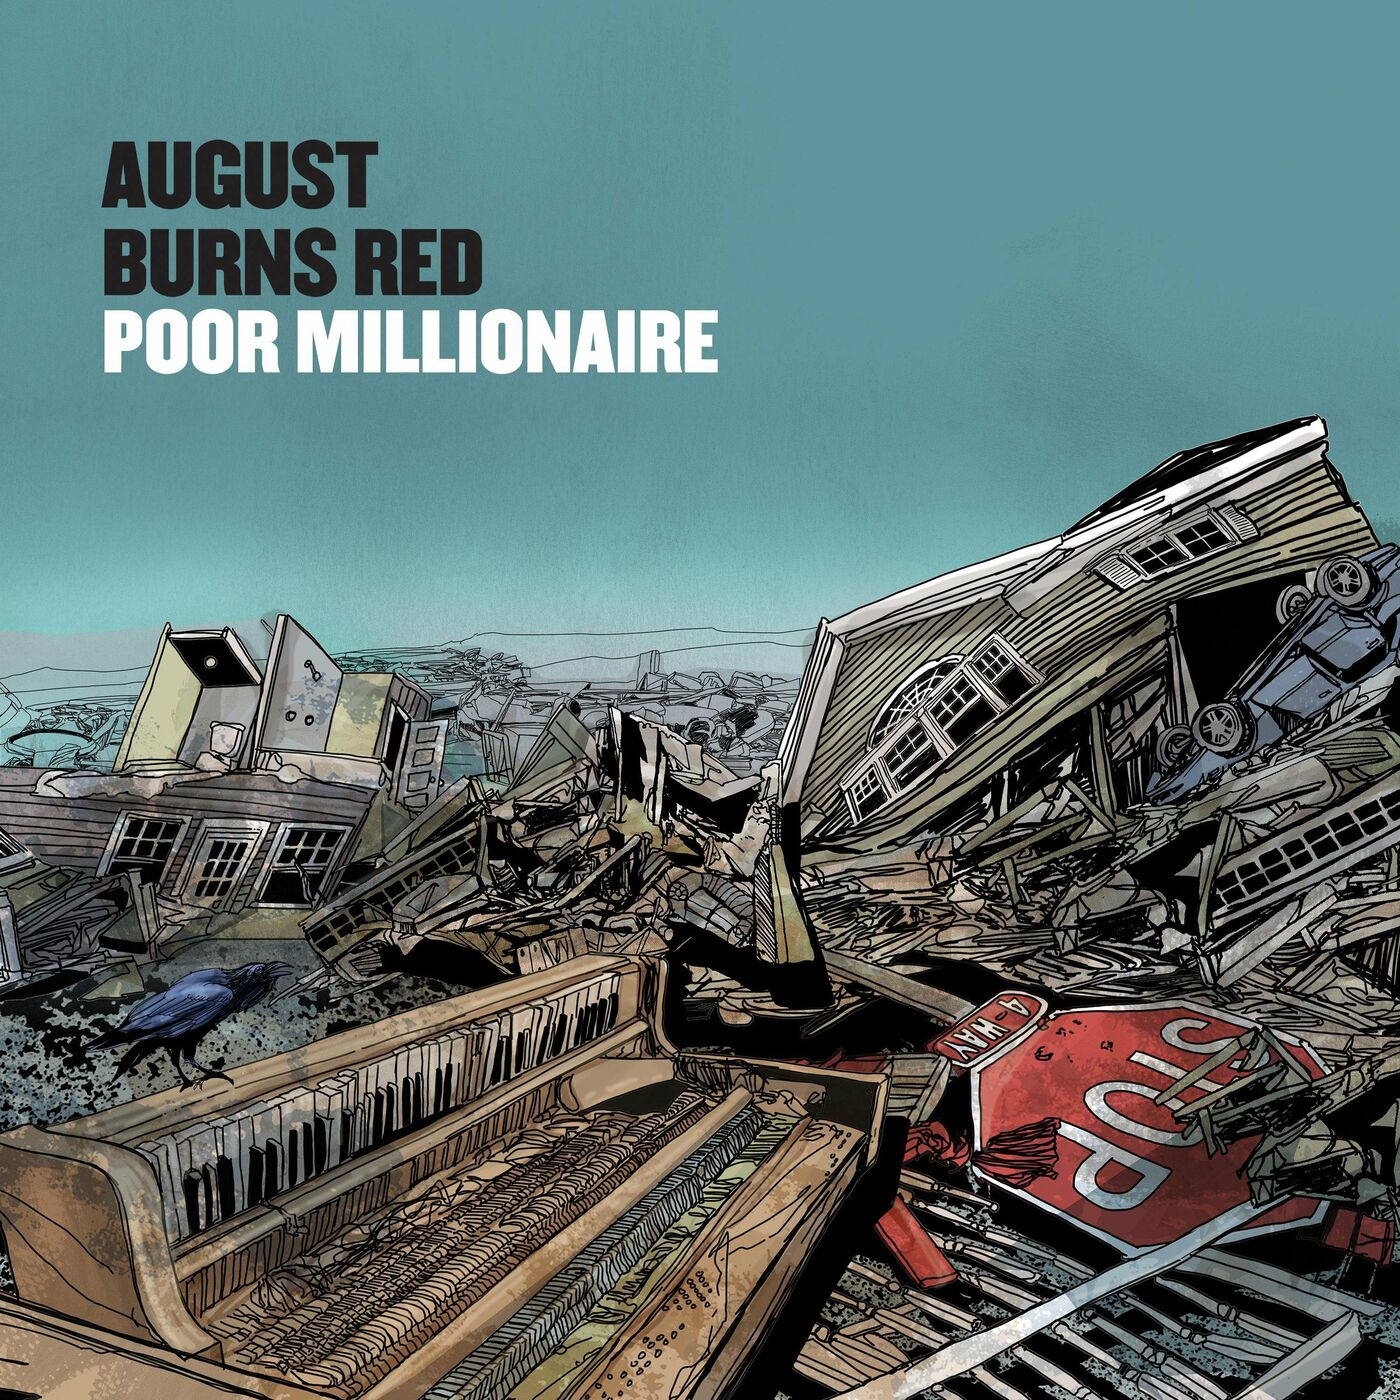 August Burns Red - Poor Millionaire [single] (2021)